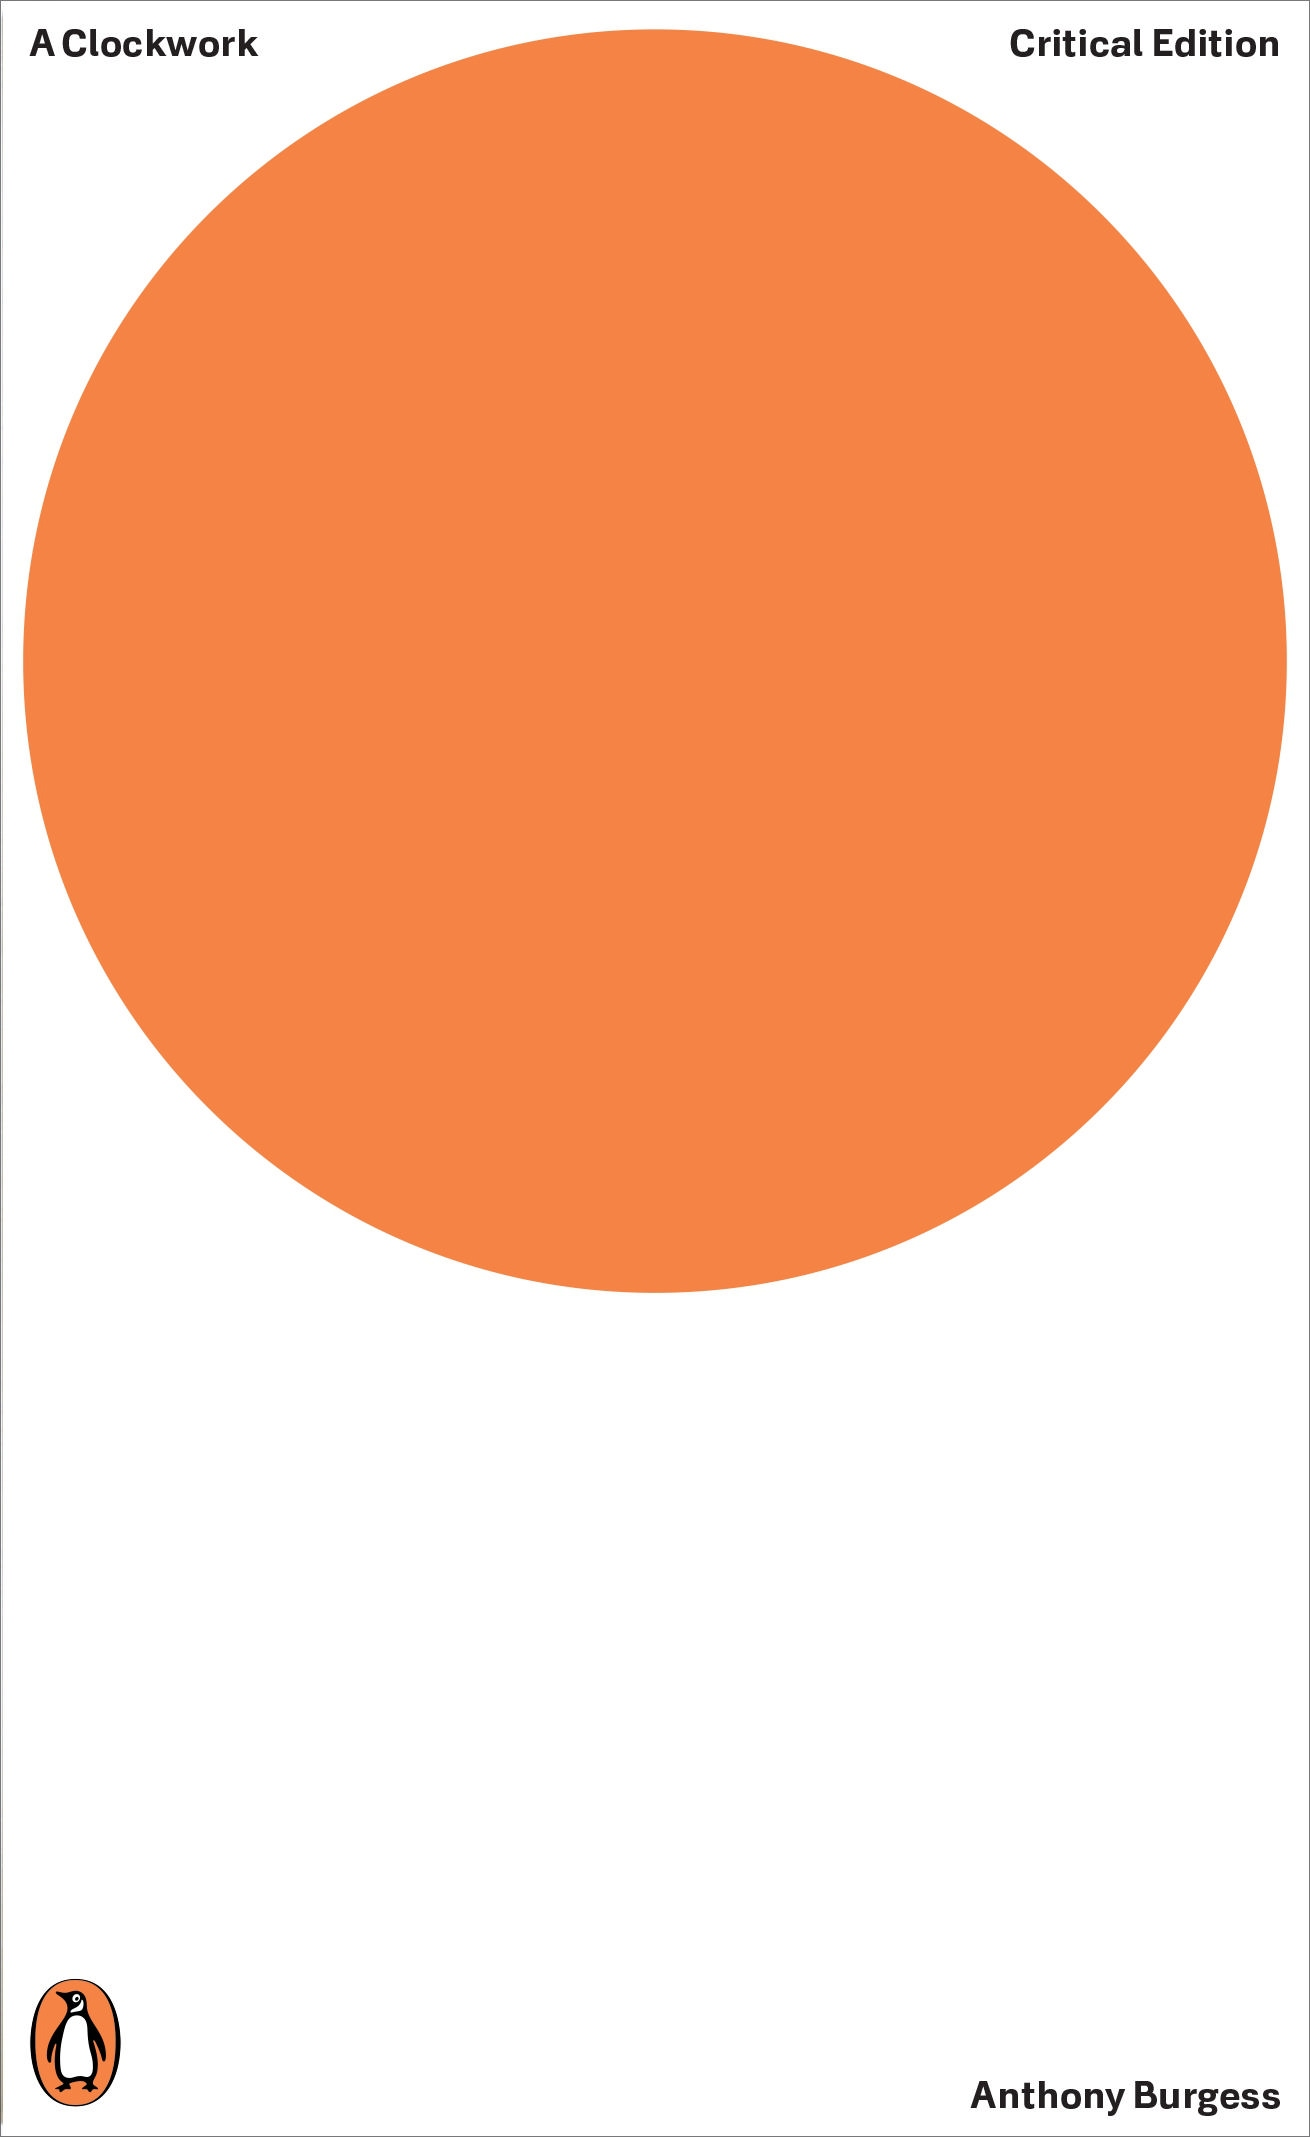 themes in a clockwork orange book